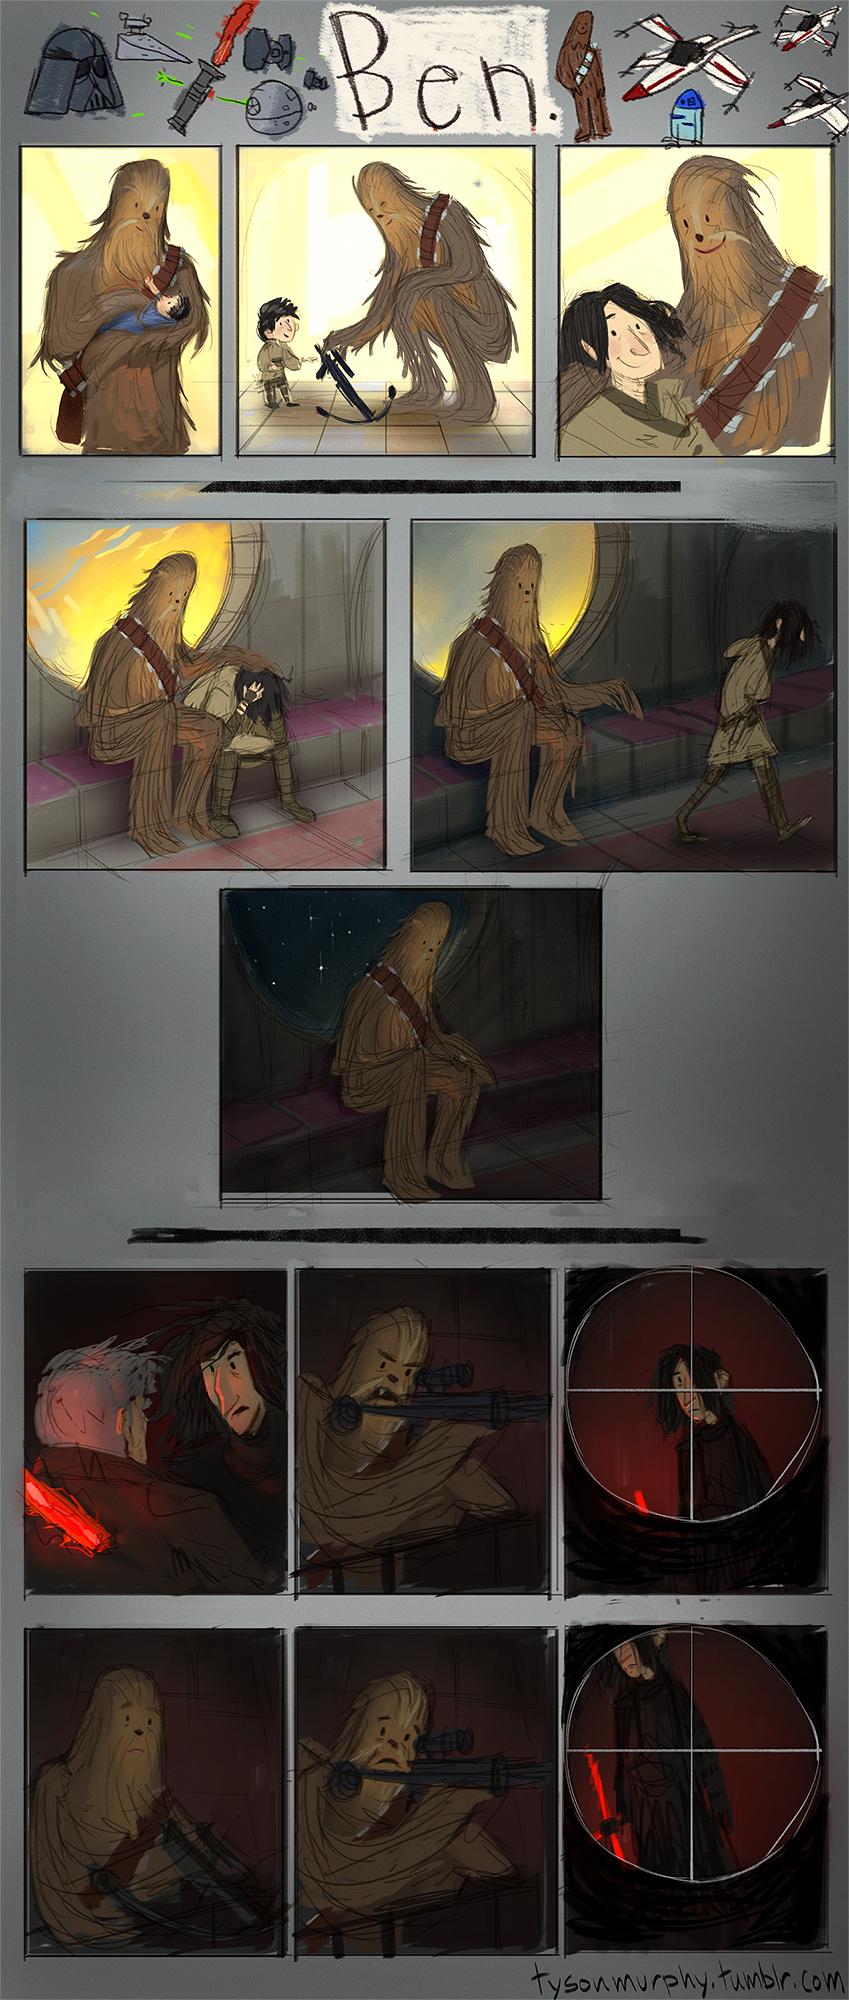 chewbacca-kylo-ren-relationship